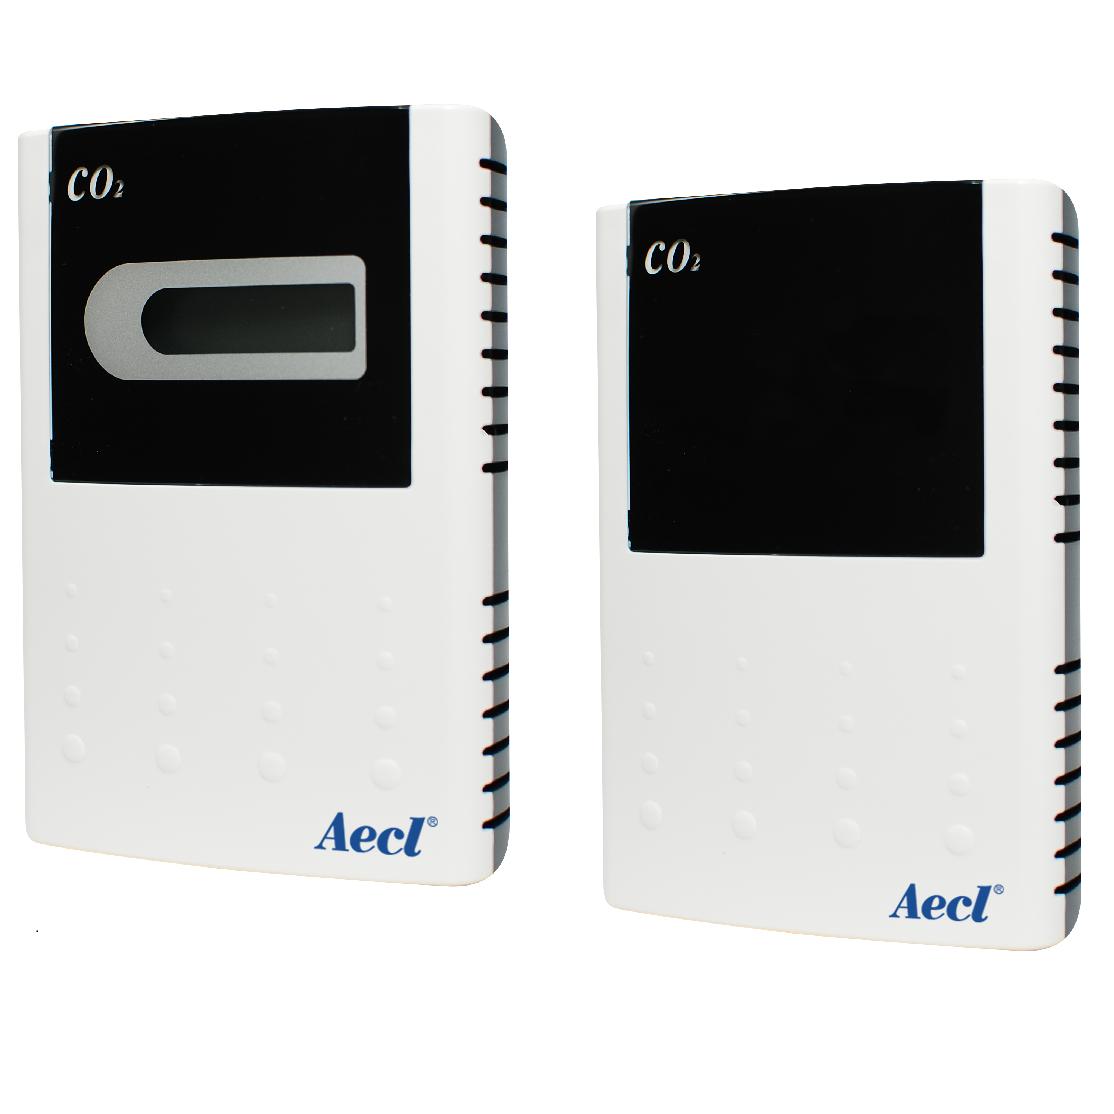 transmissor LoRa CO2 sem fio